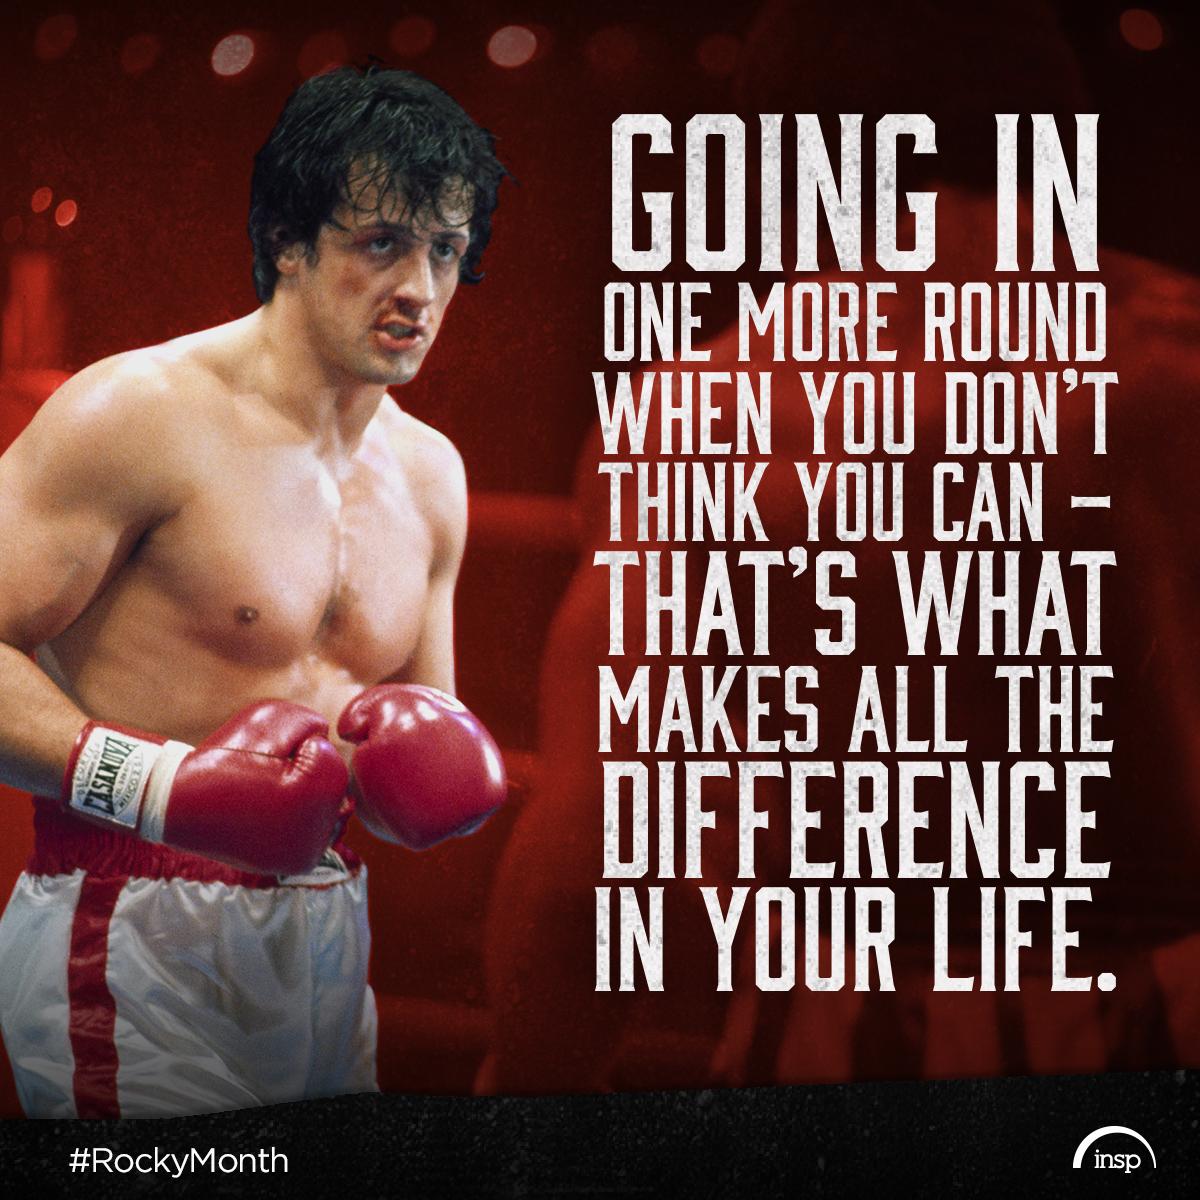 #RockyMonth